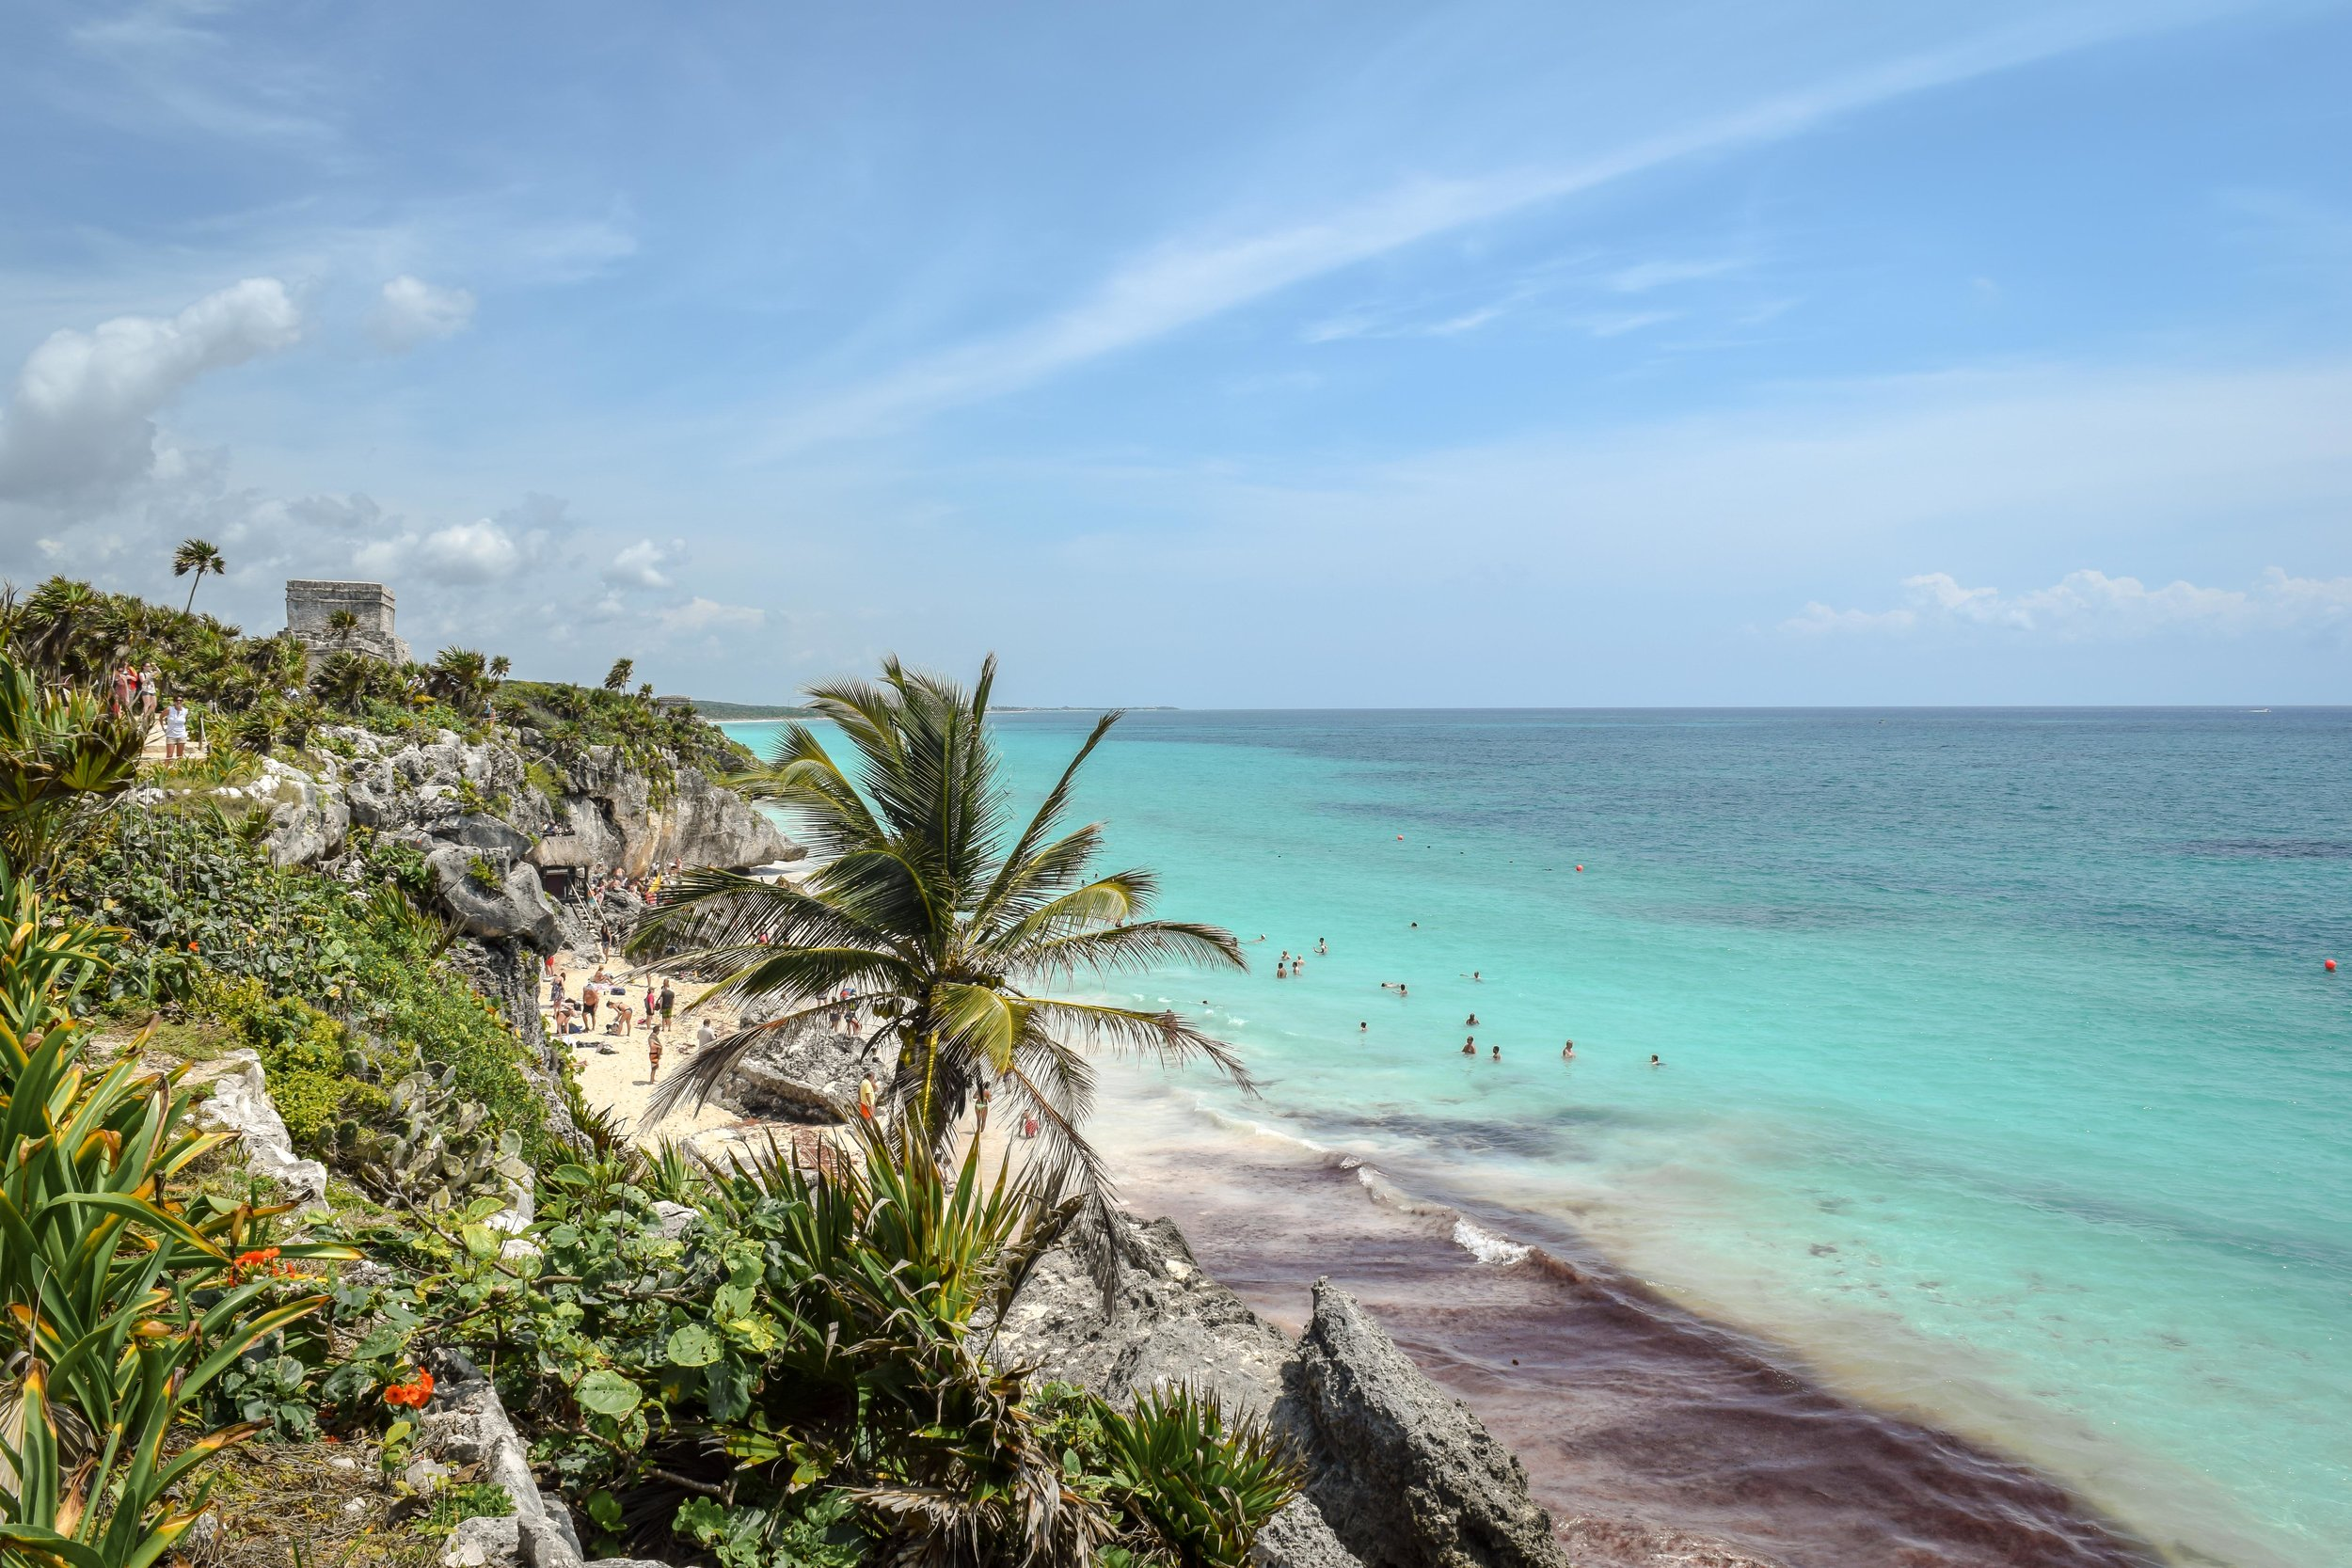 Tulum and the turquoise Caribbean coastline